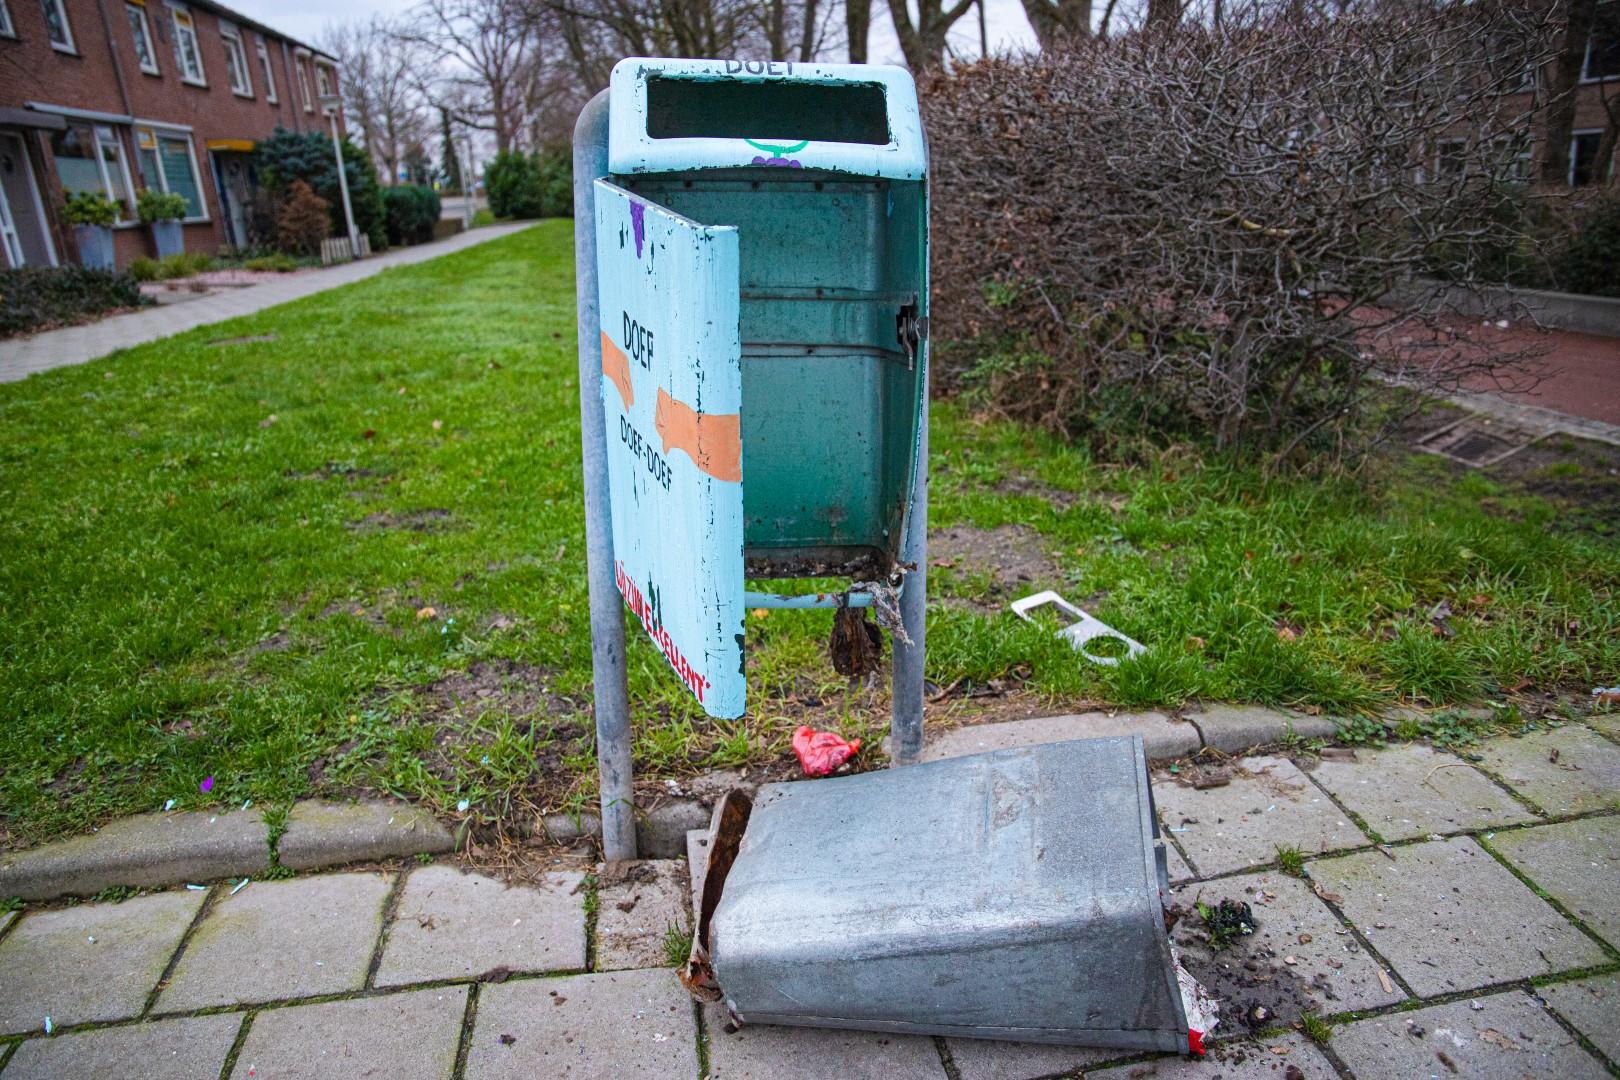 tuinderspad vuilnis vuilnisbak afval afvalbak vuurwerk jaarwisseling vandalisme schade ontploft